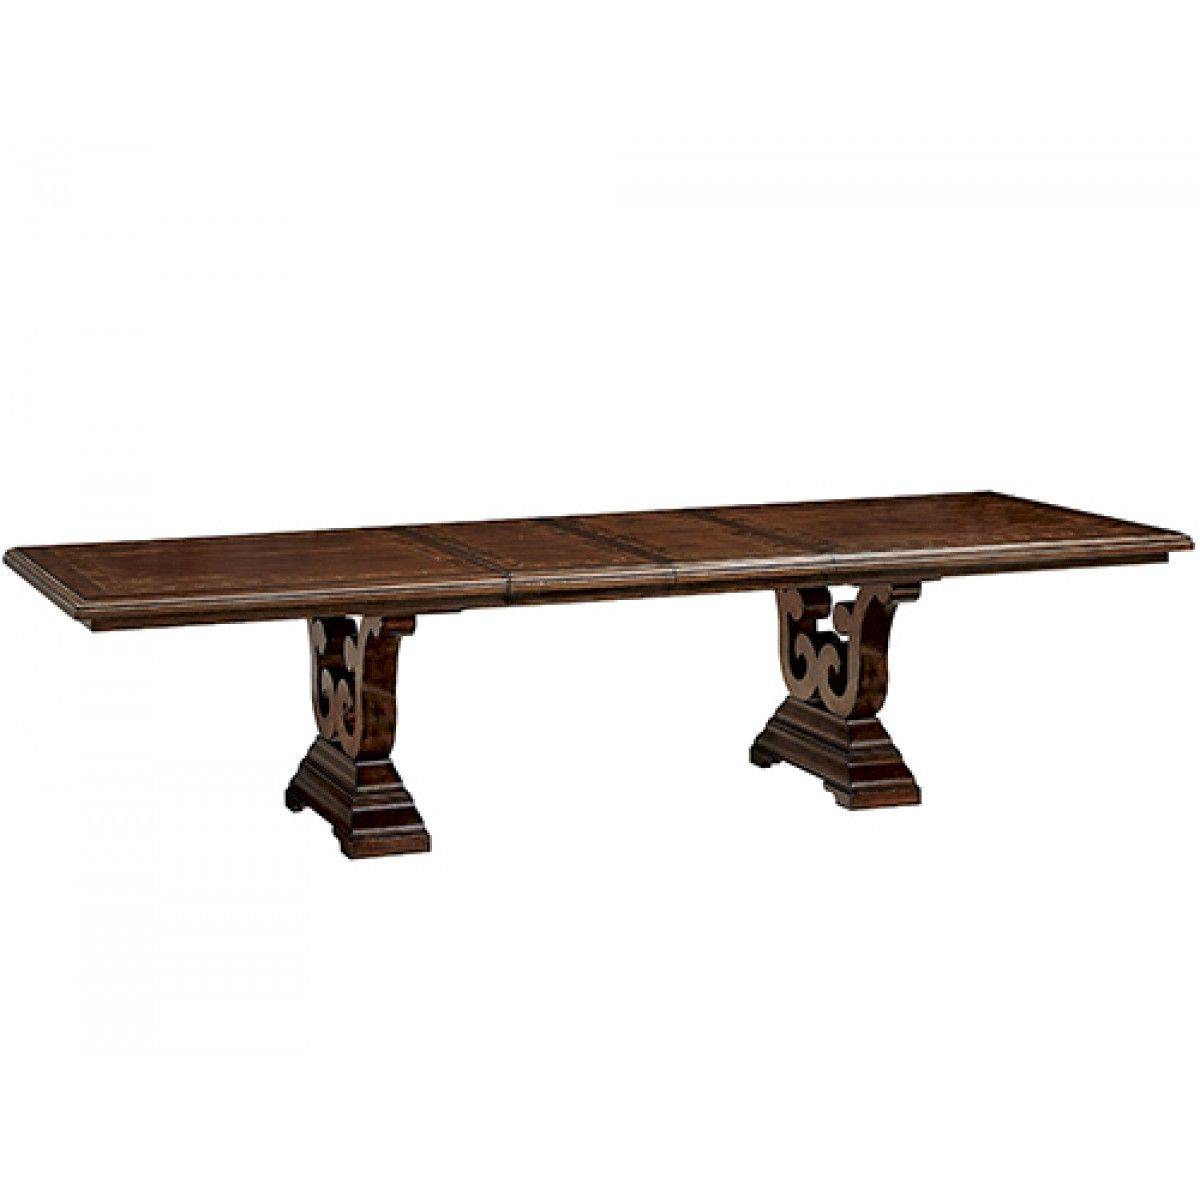 Fine Furniture Design Harbor Springs Trestle Dining Table | dining ...